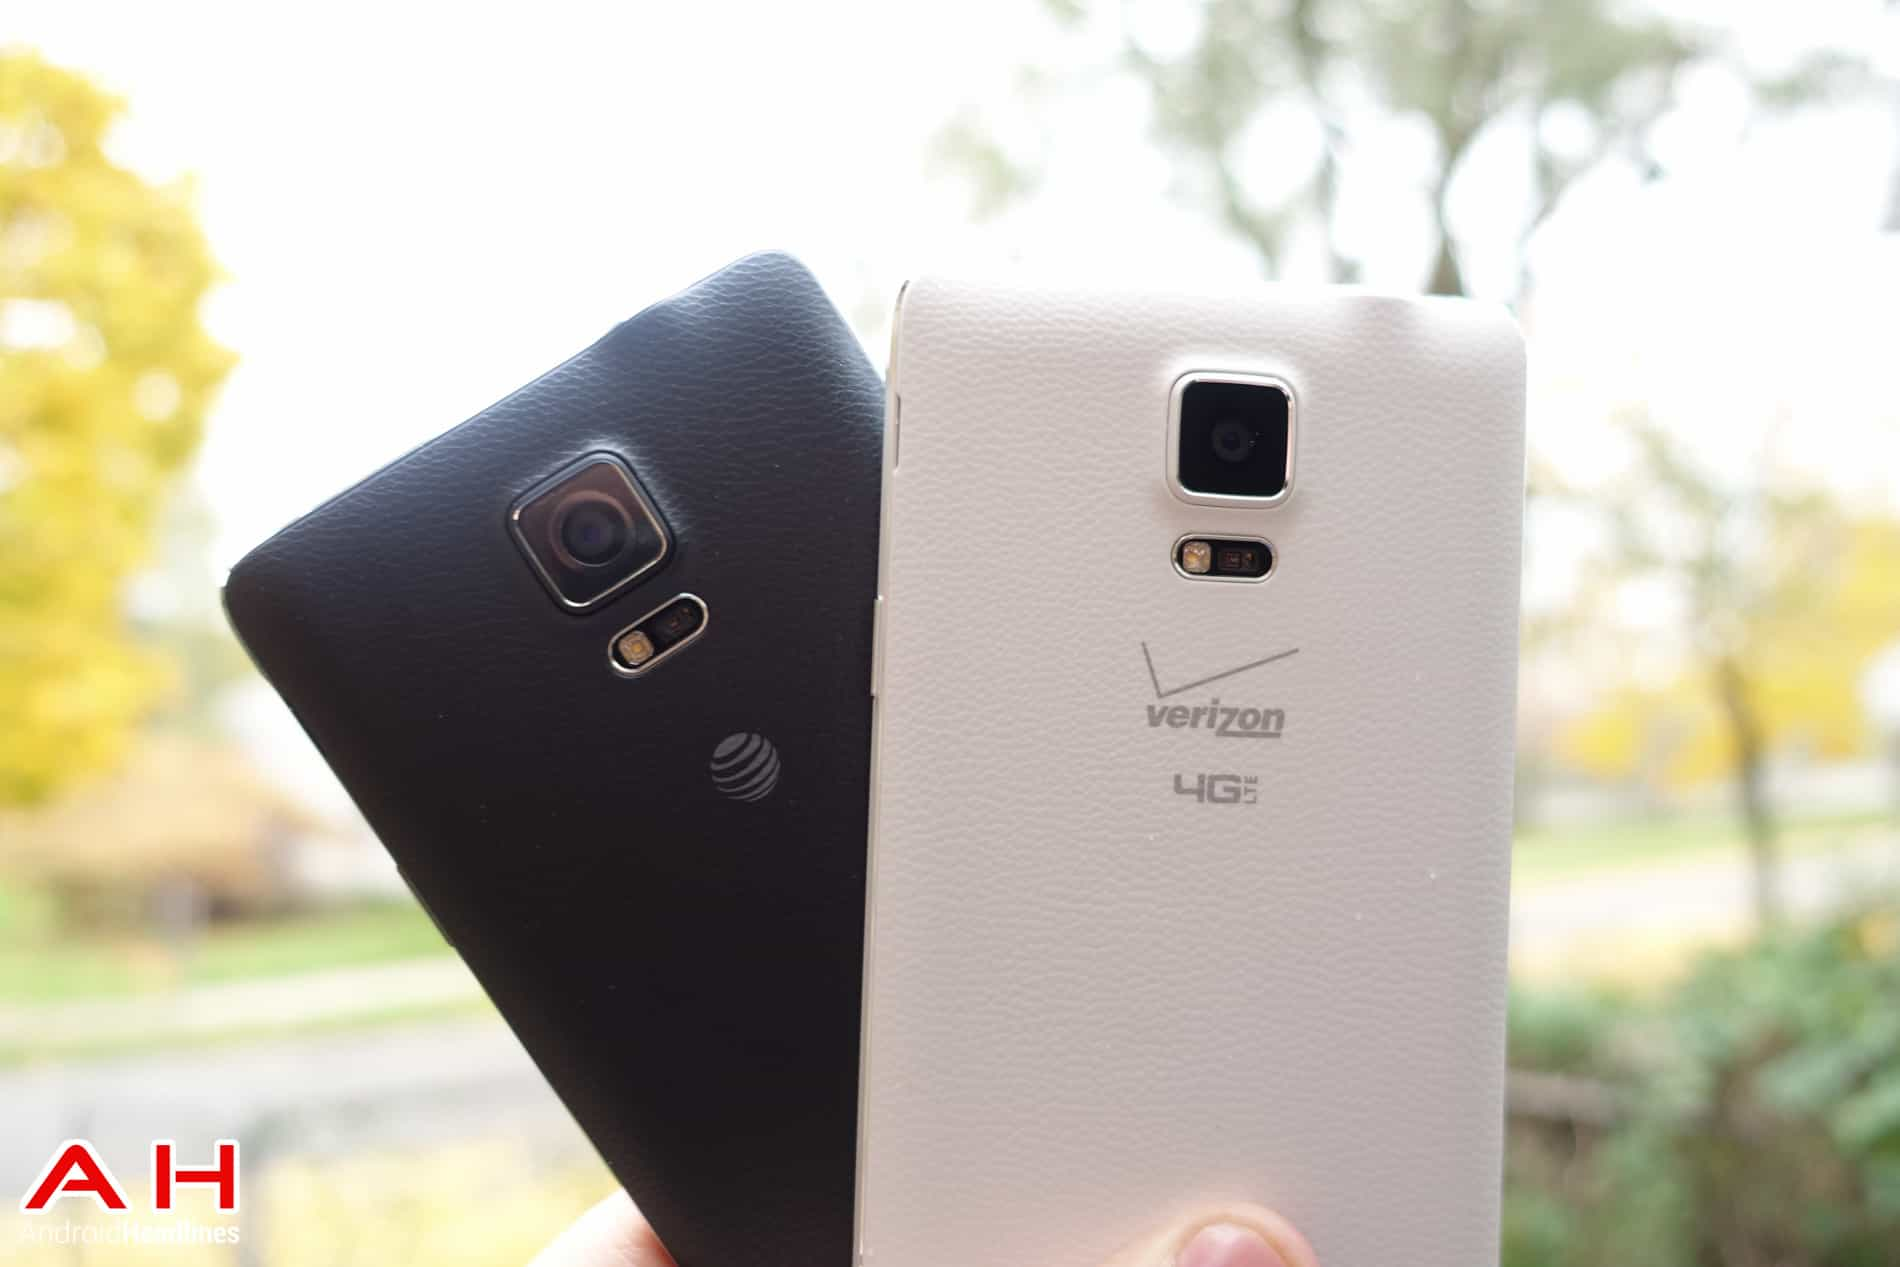 Samsung-Galaxy-Note-4-AH-3